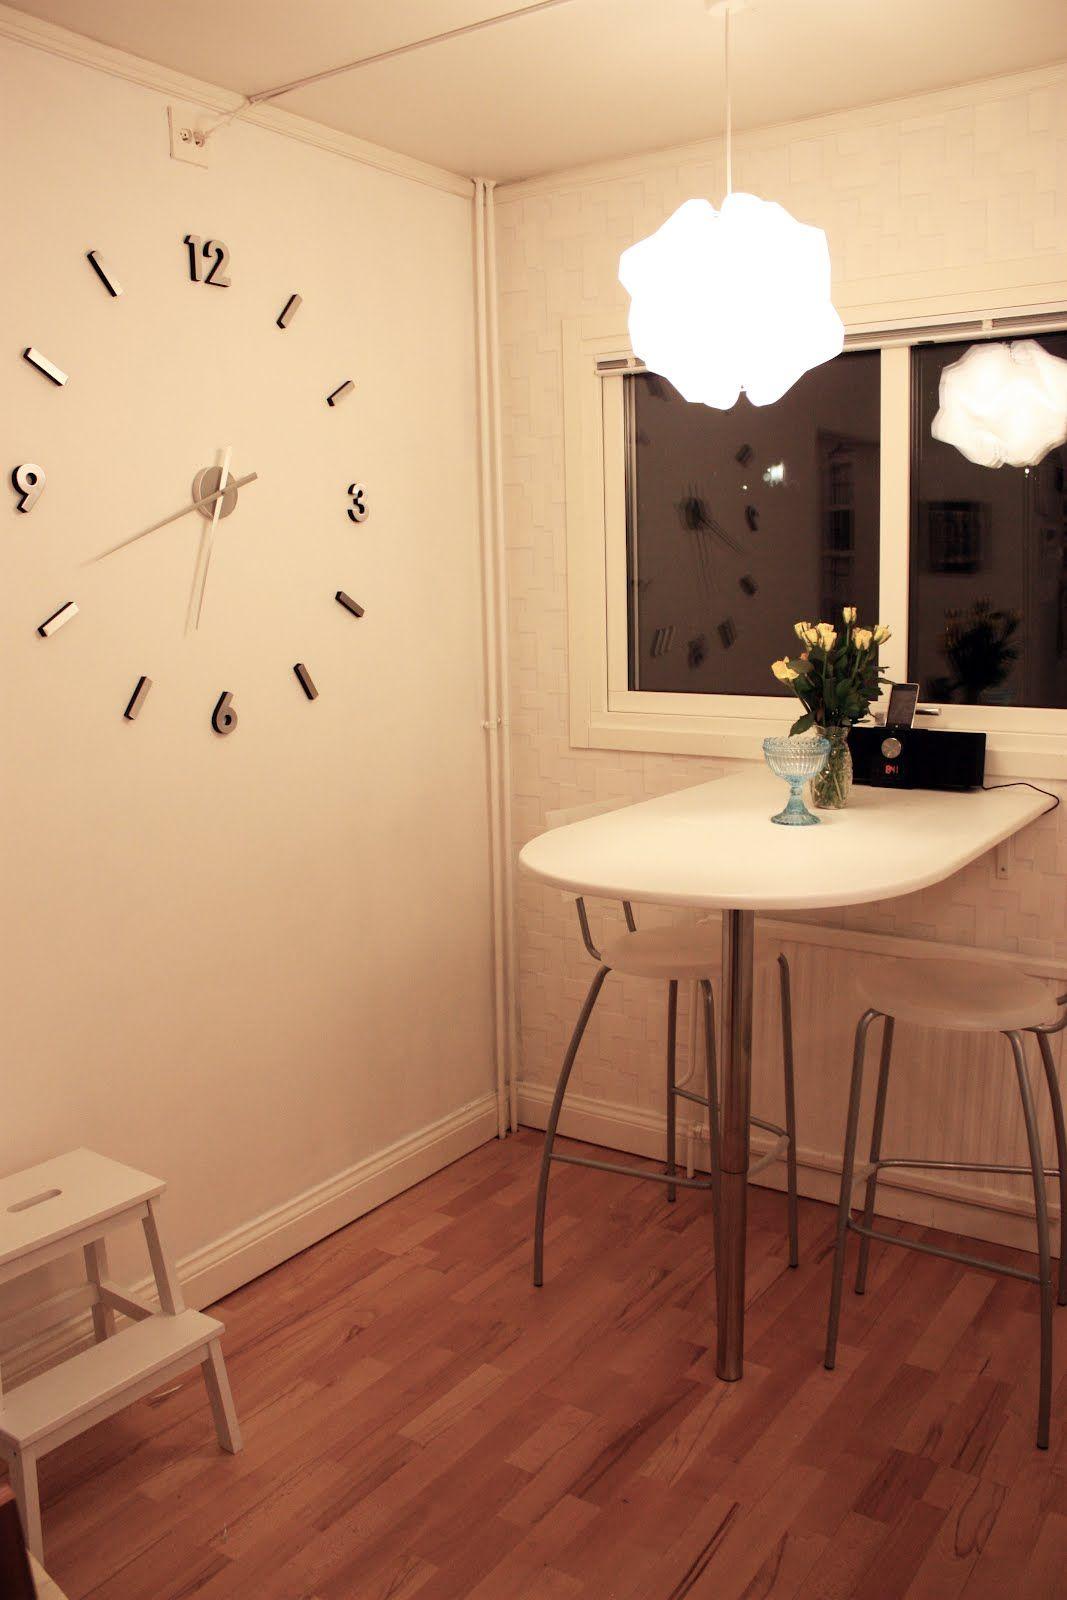 Love the wall clock idea. | DIY | Pinterest | Best Clock ideas, Wall ...